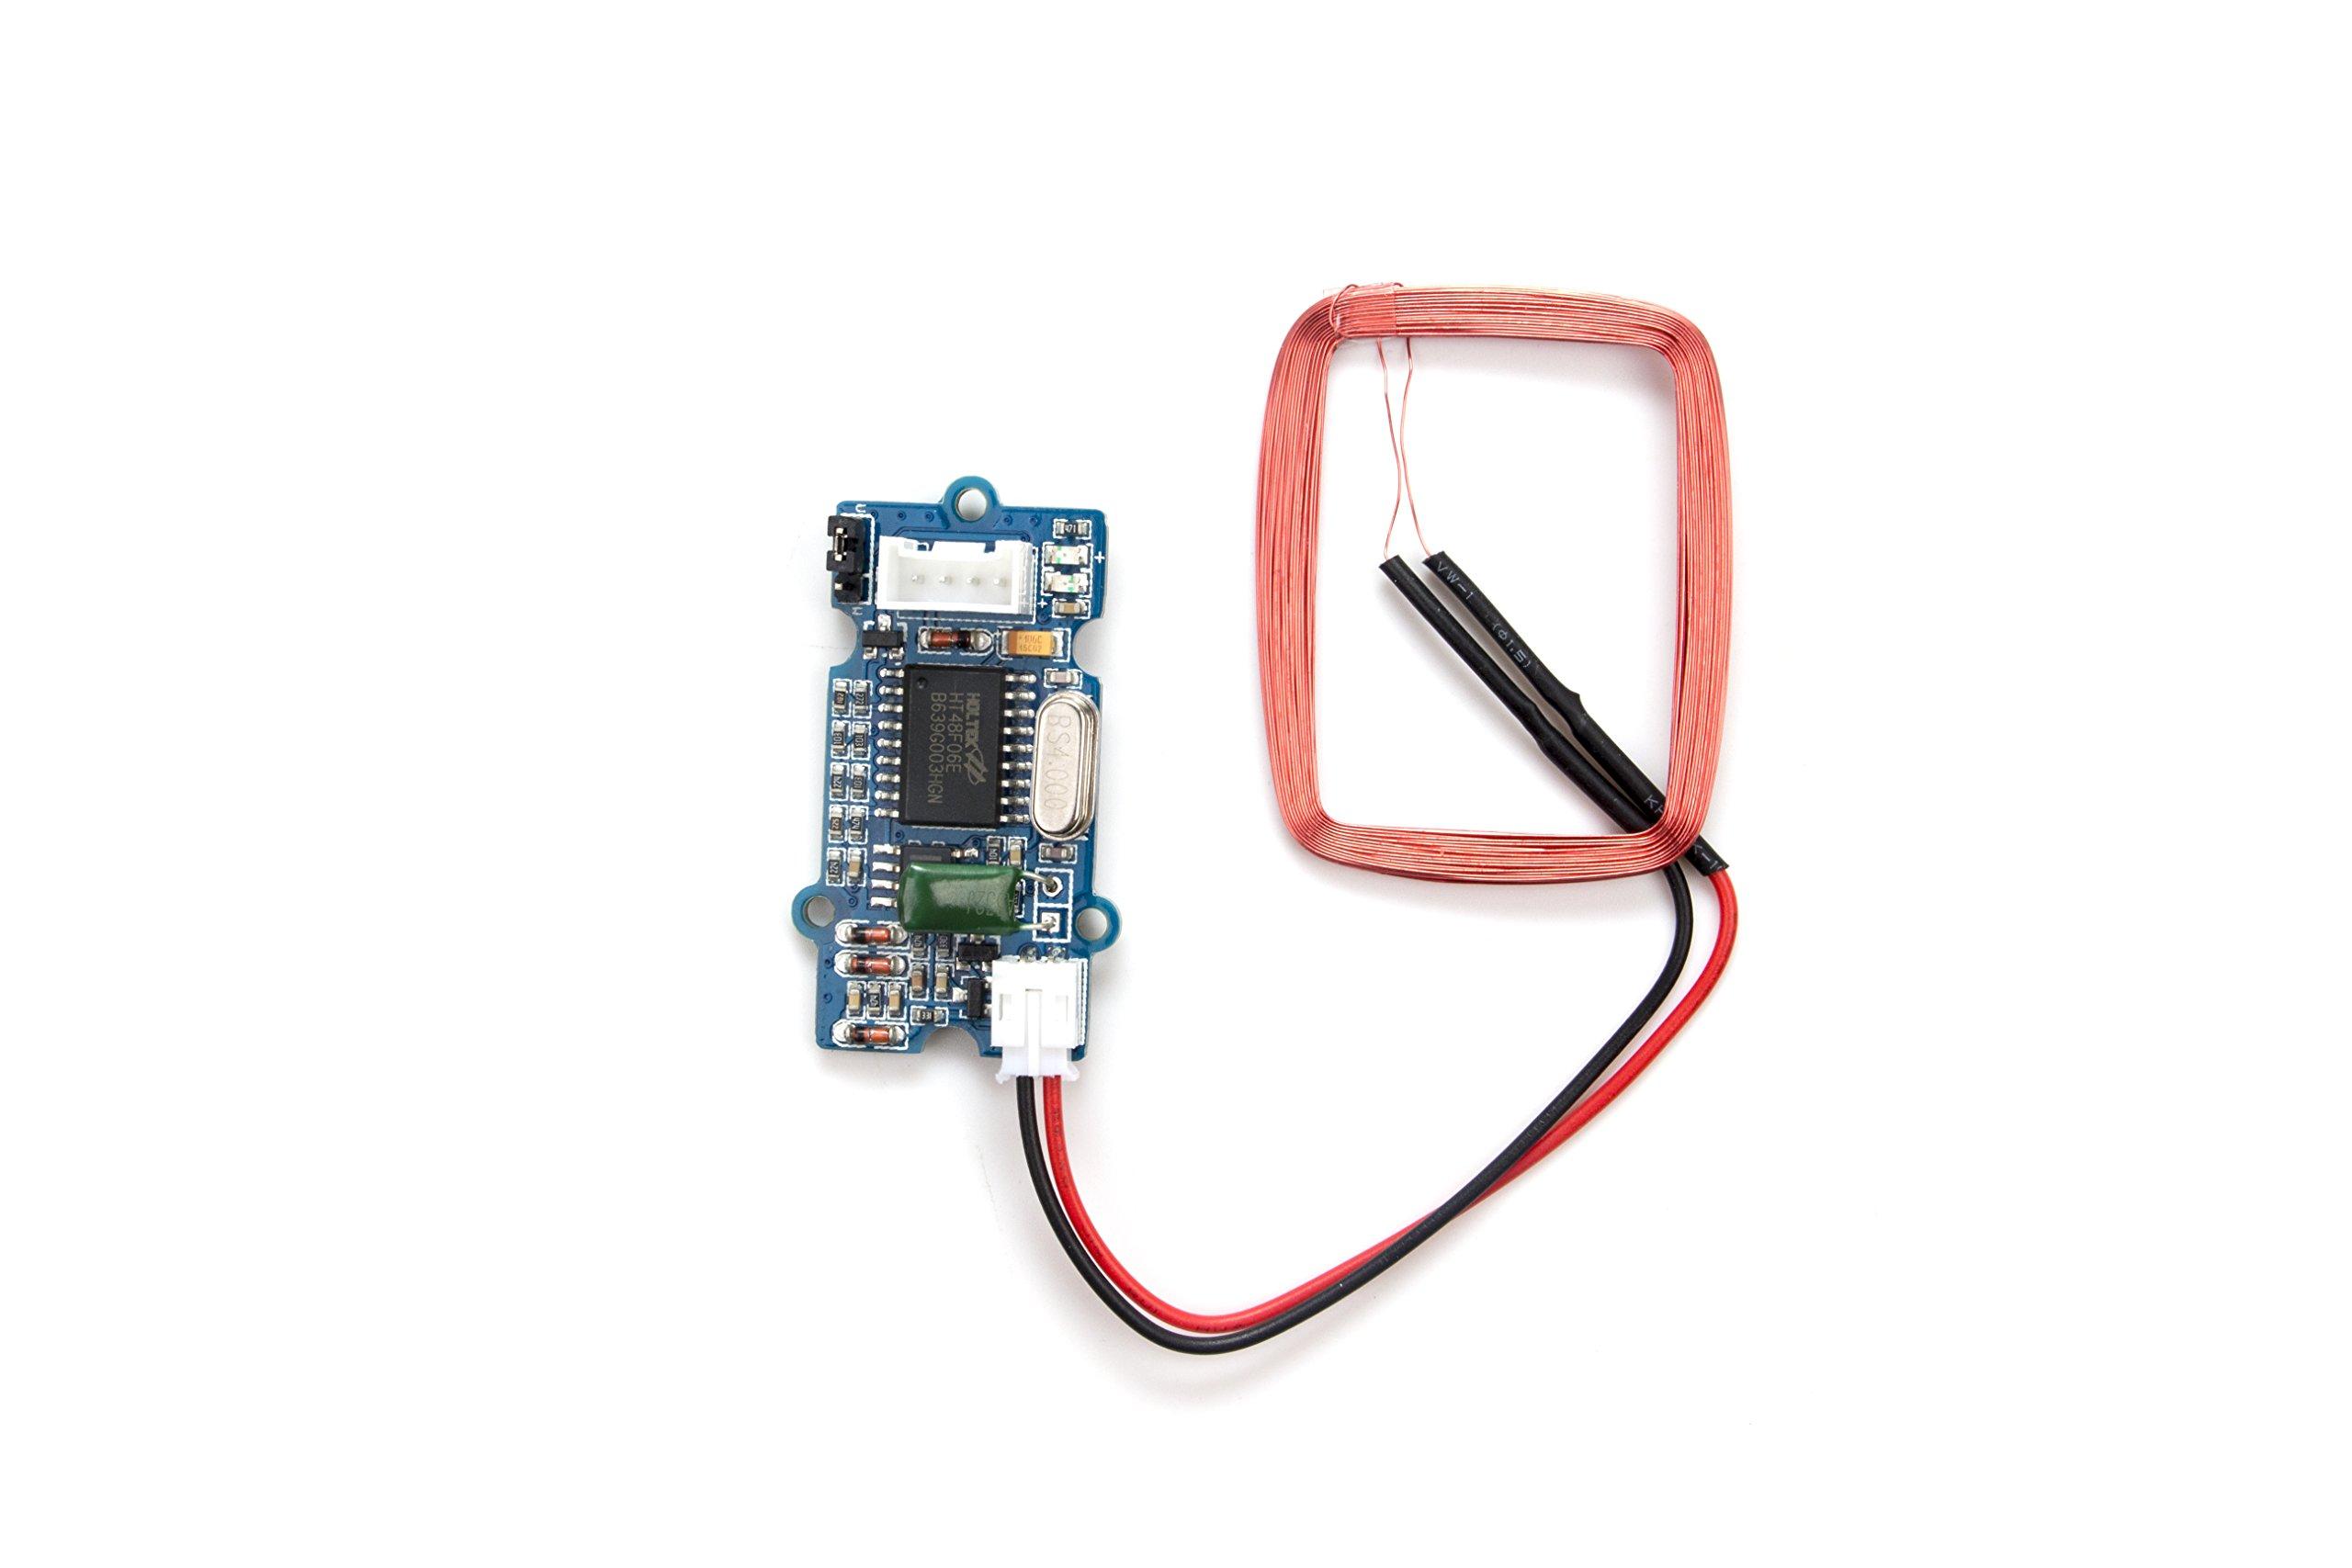 SeeedStudio - Grove - 125Khz RFID Reader